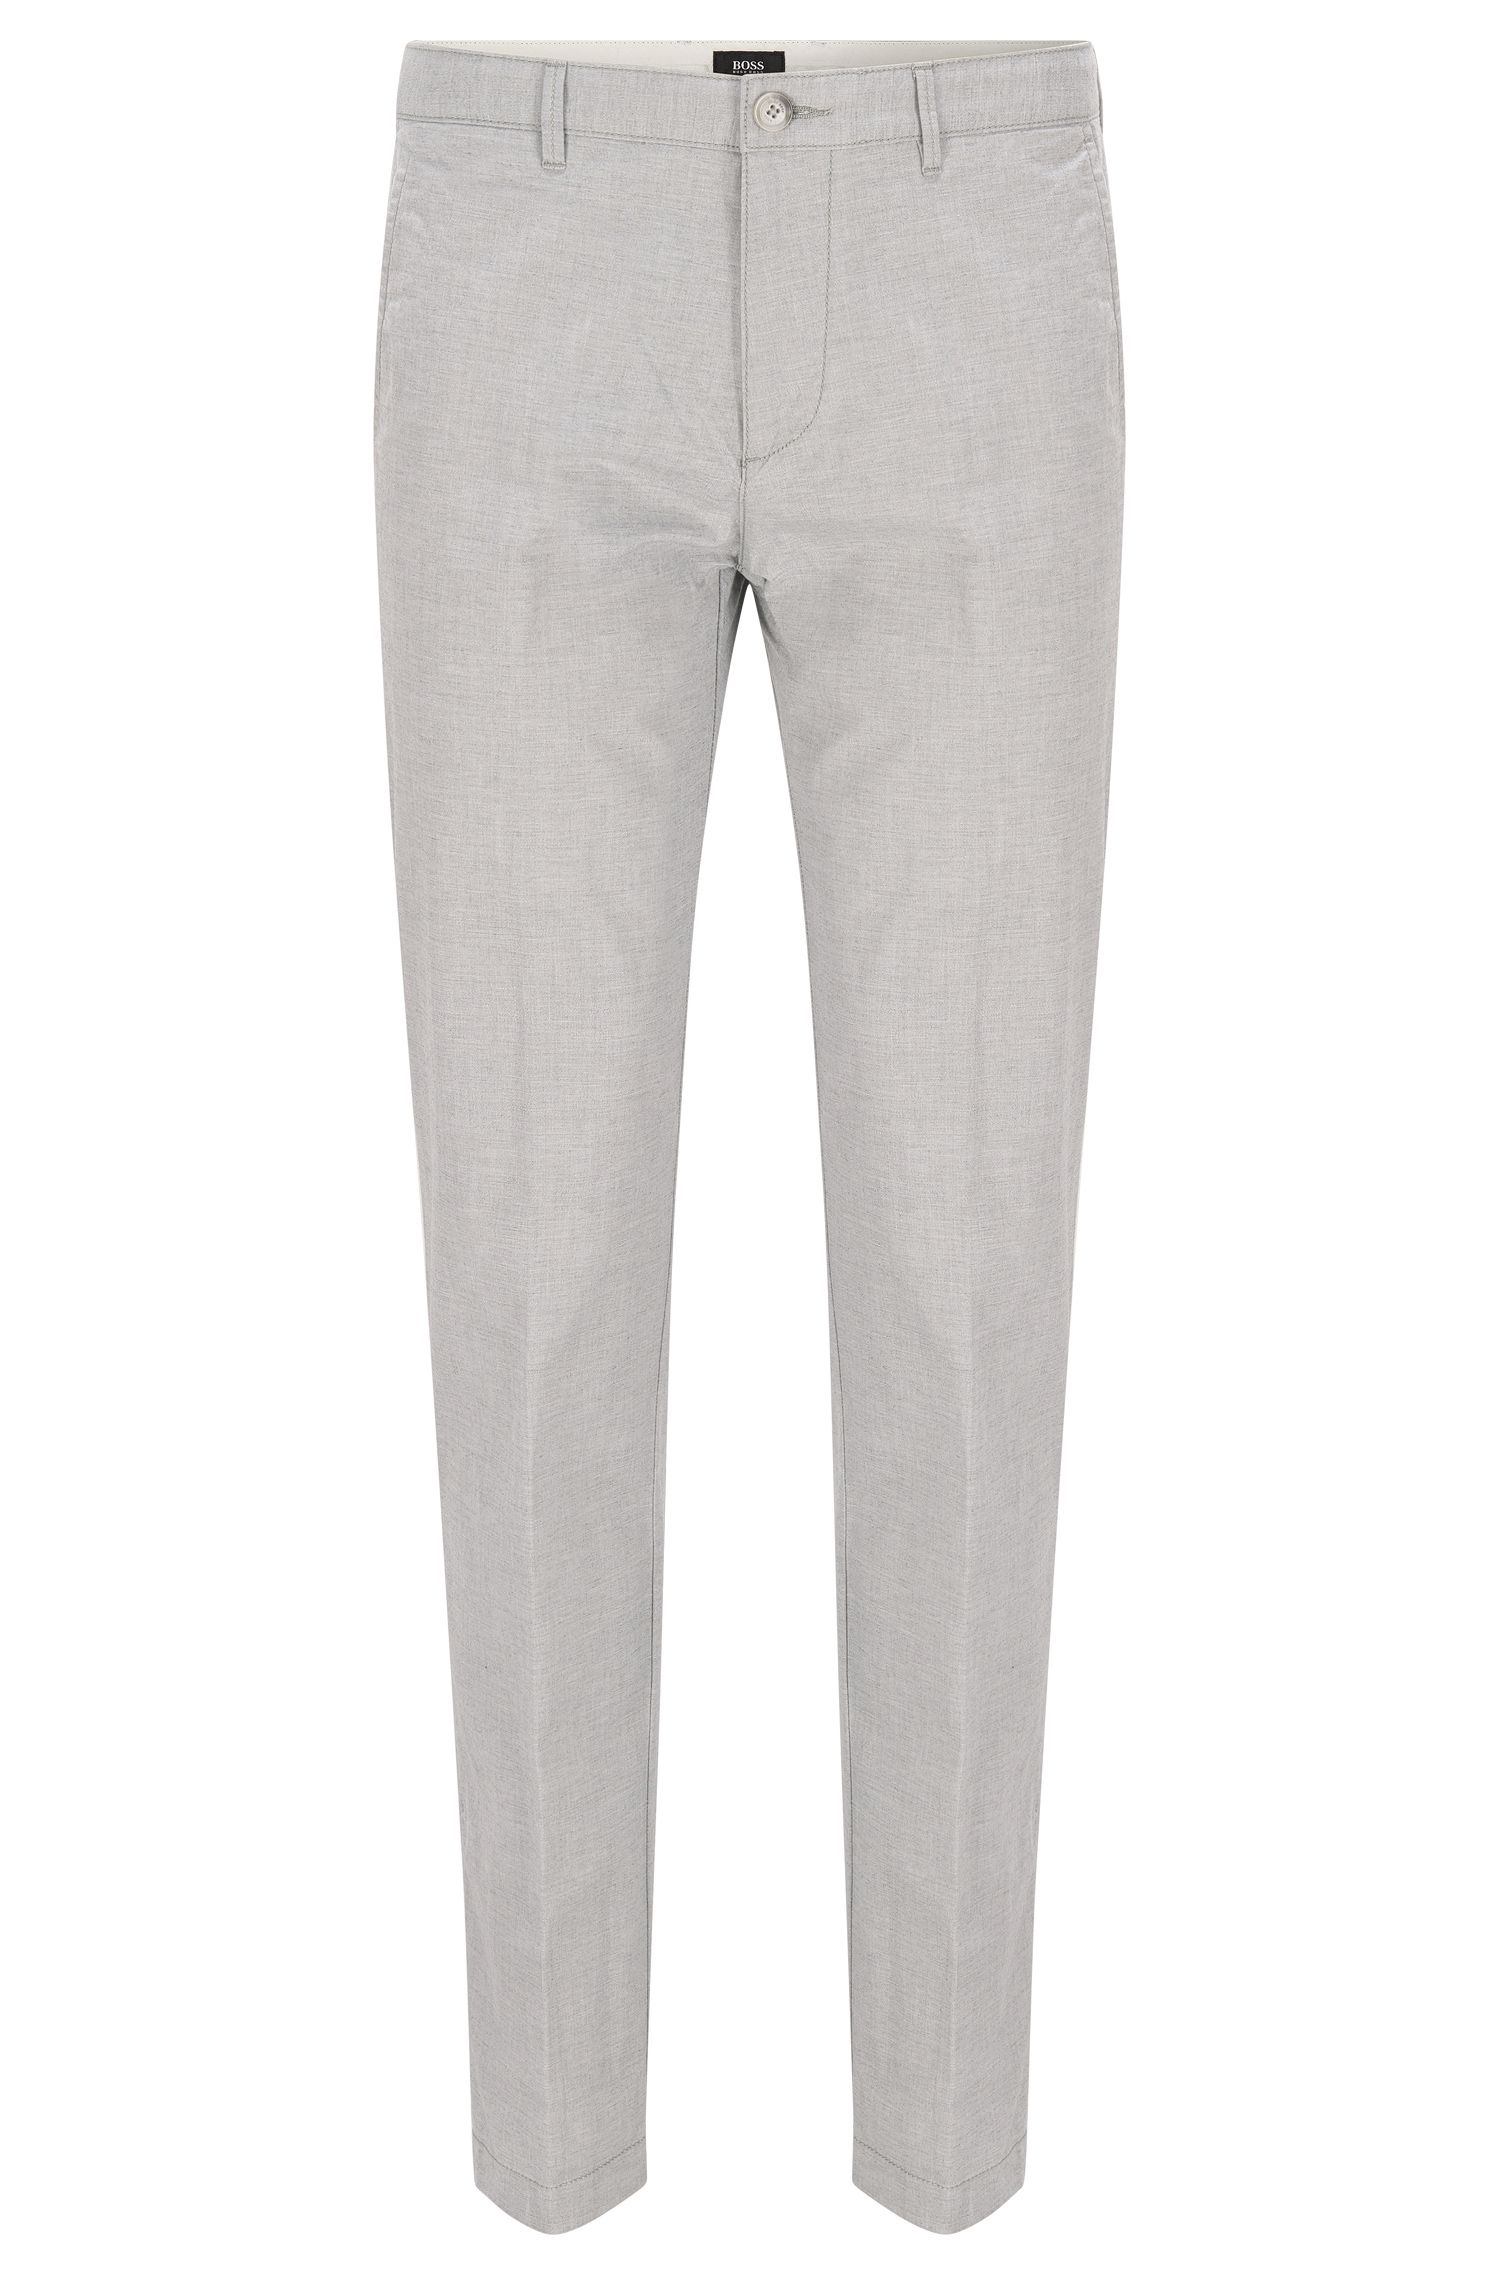 'Crigan W'   Regular Fit, Stretch Cotton Pants